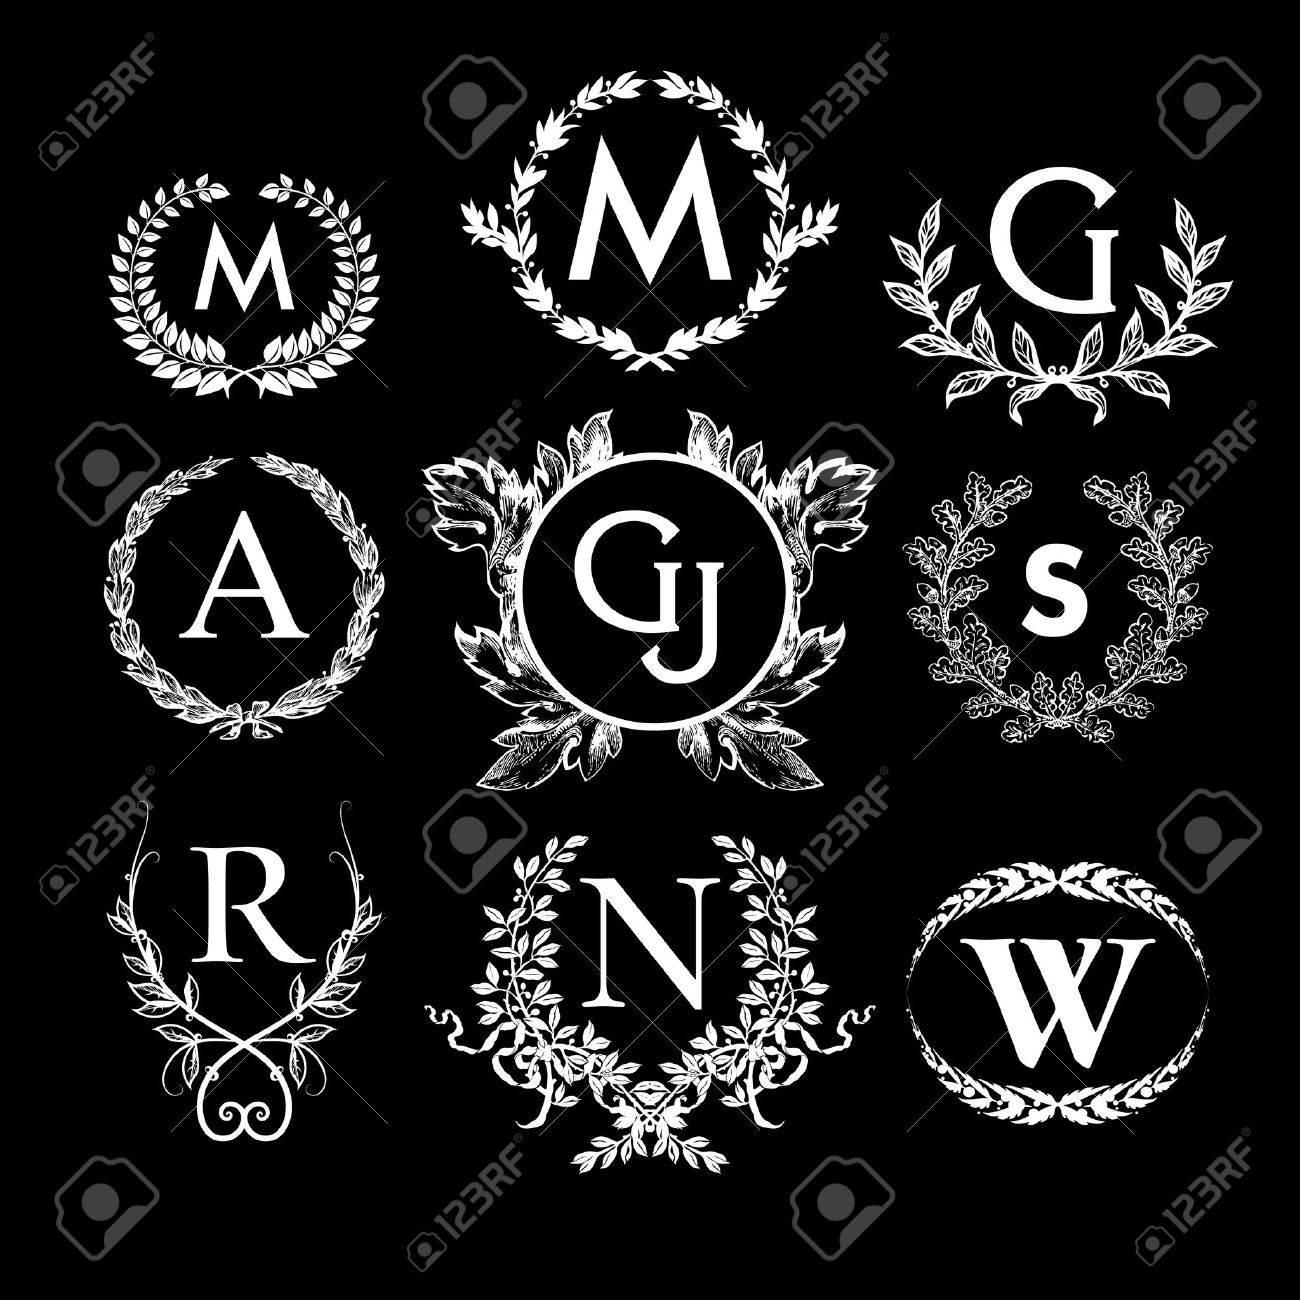 set of monochrome luxury monograms labels laurel wreaths or